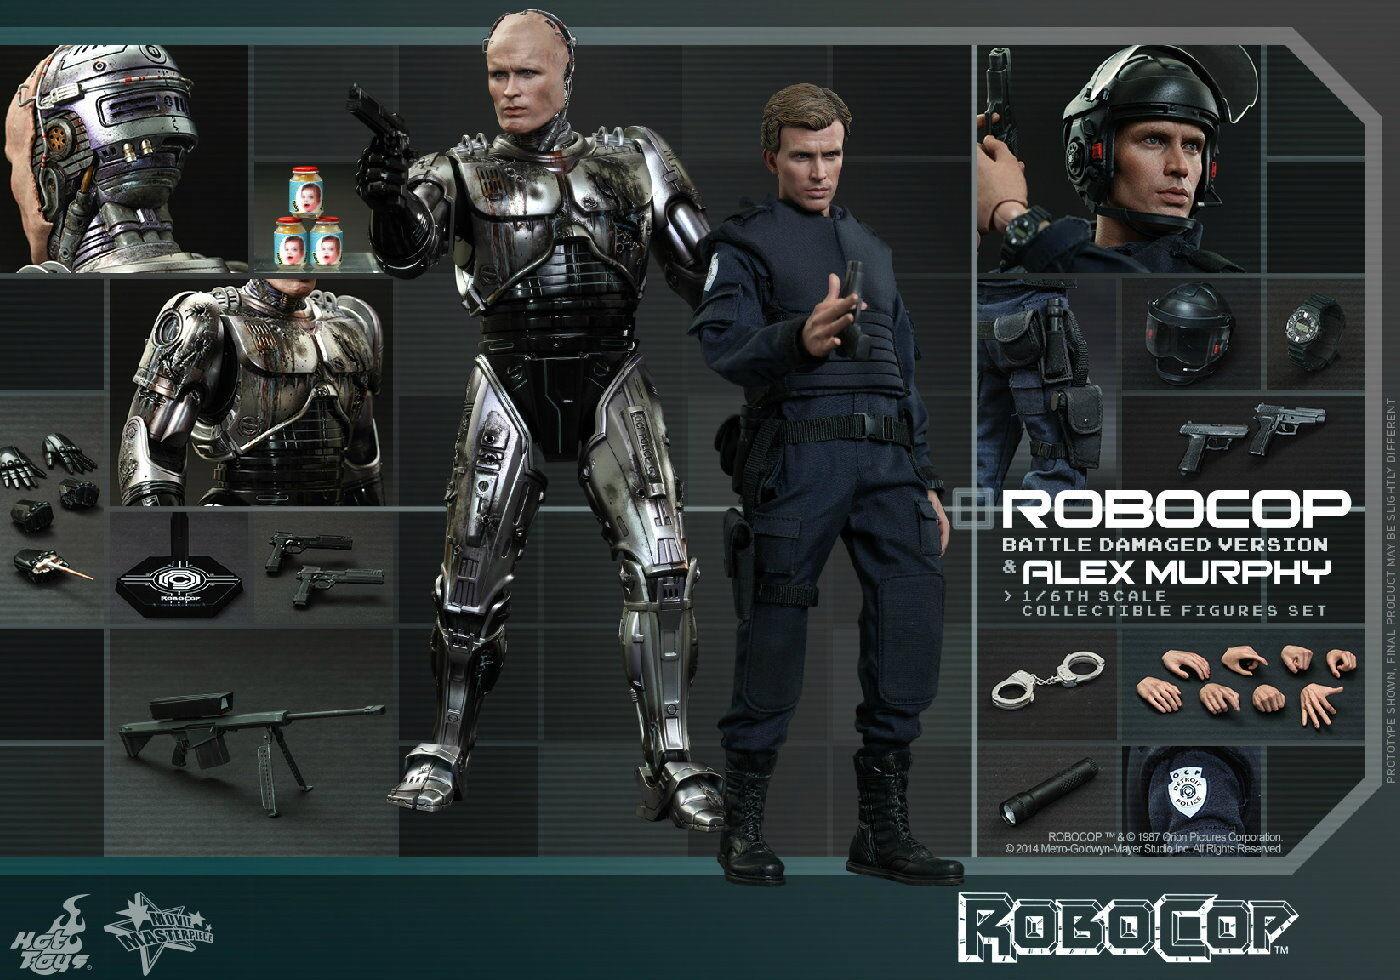 Hot Toys 1 6 Robocop Robocop Robocop MMS266 Battle Damaged & Alex Murphy figura 2-Pack Set  punto de venta barato